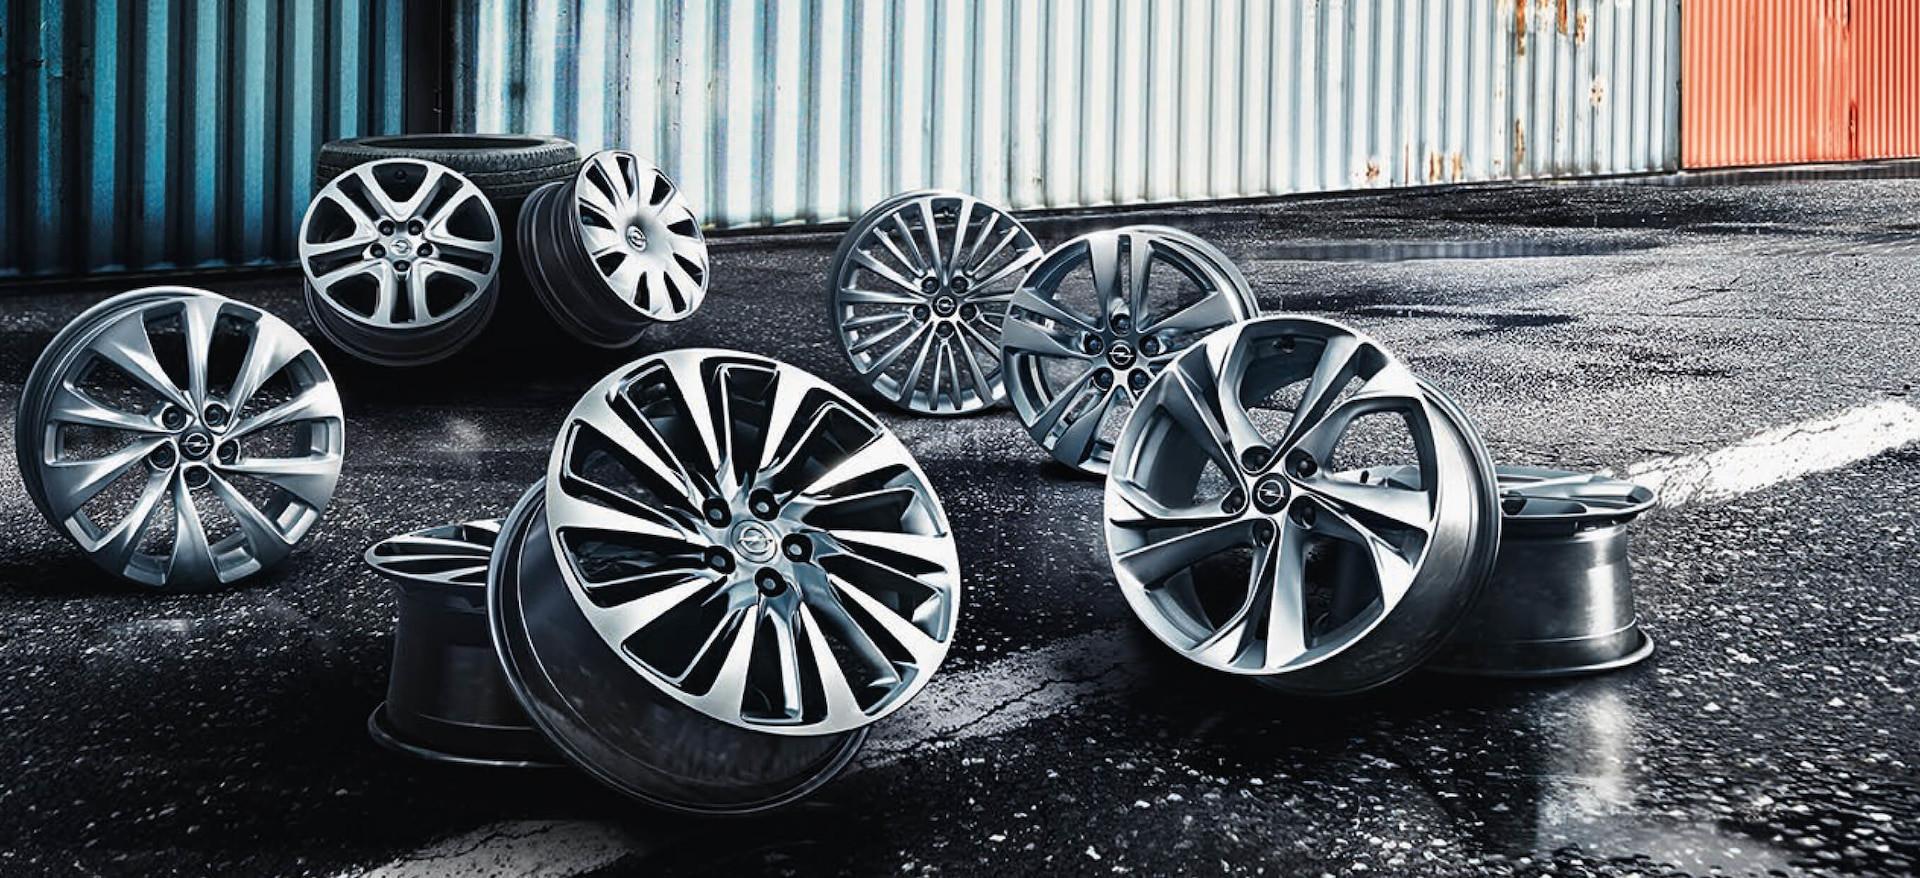 Opel_Astra_Hatchback_Wheels_21x9_as16_w0